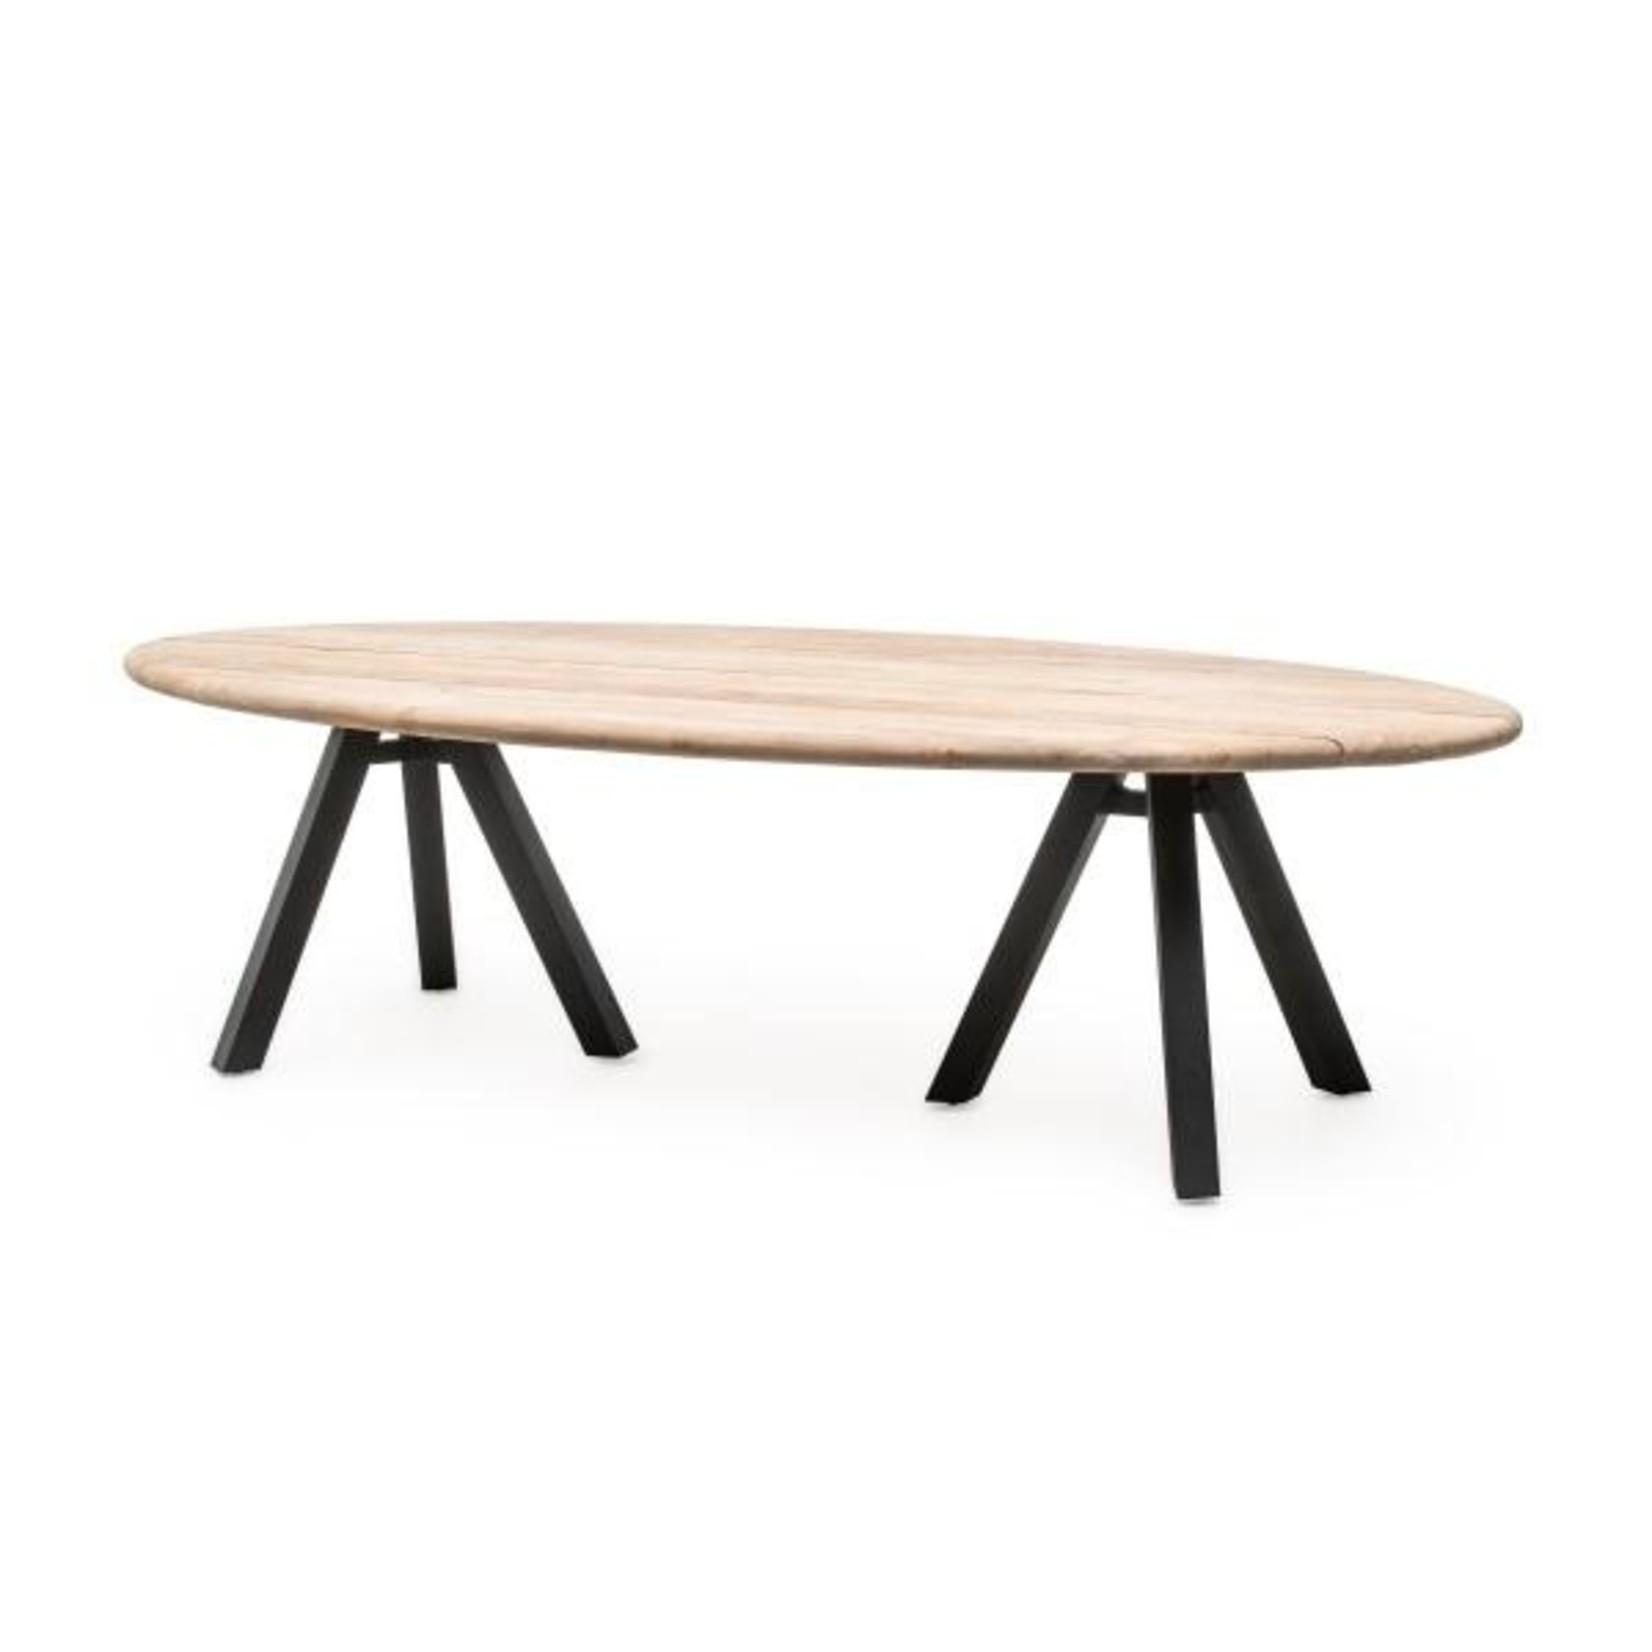 Gommaire Table Samuel | Reclaimed Teak Natural Grey & Aluminium Matte Black